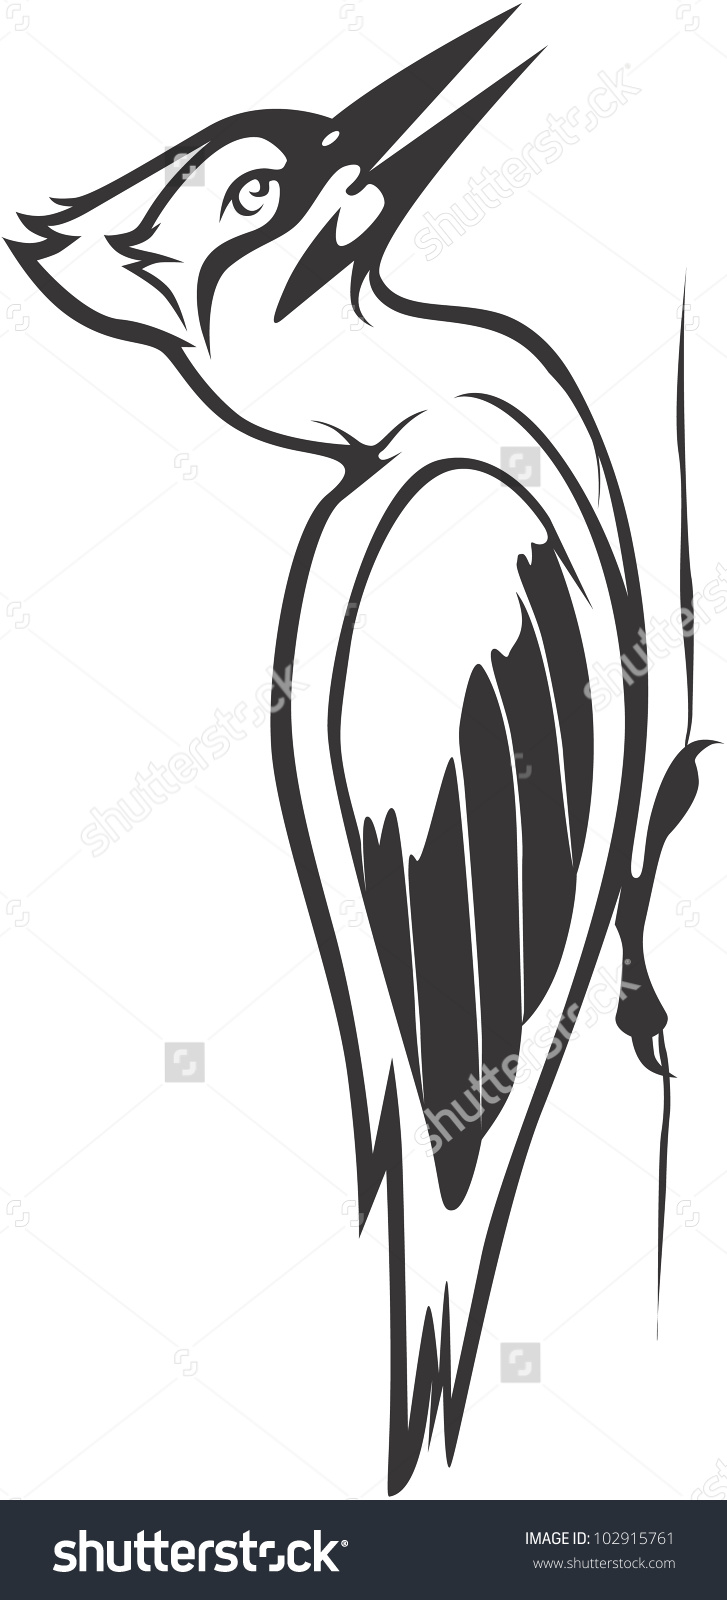 Creative Ivory Billed Woodpecker Illustration Stock Vector.